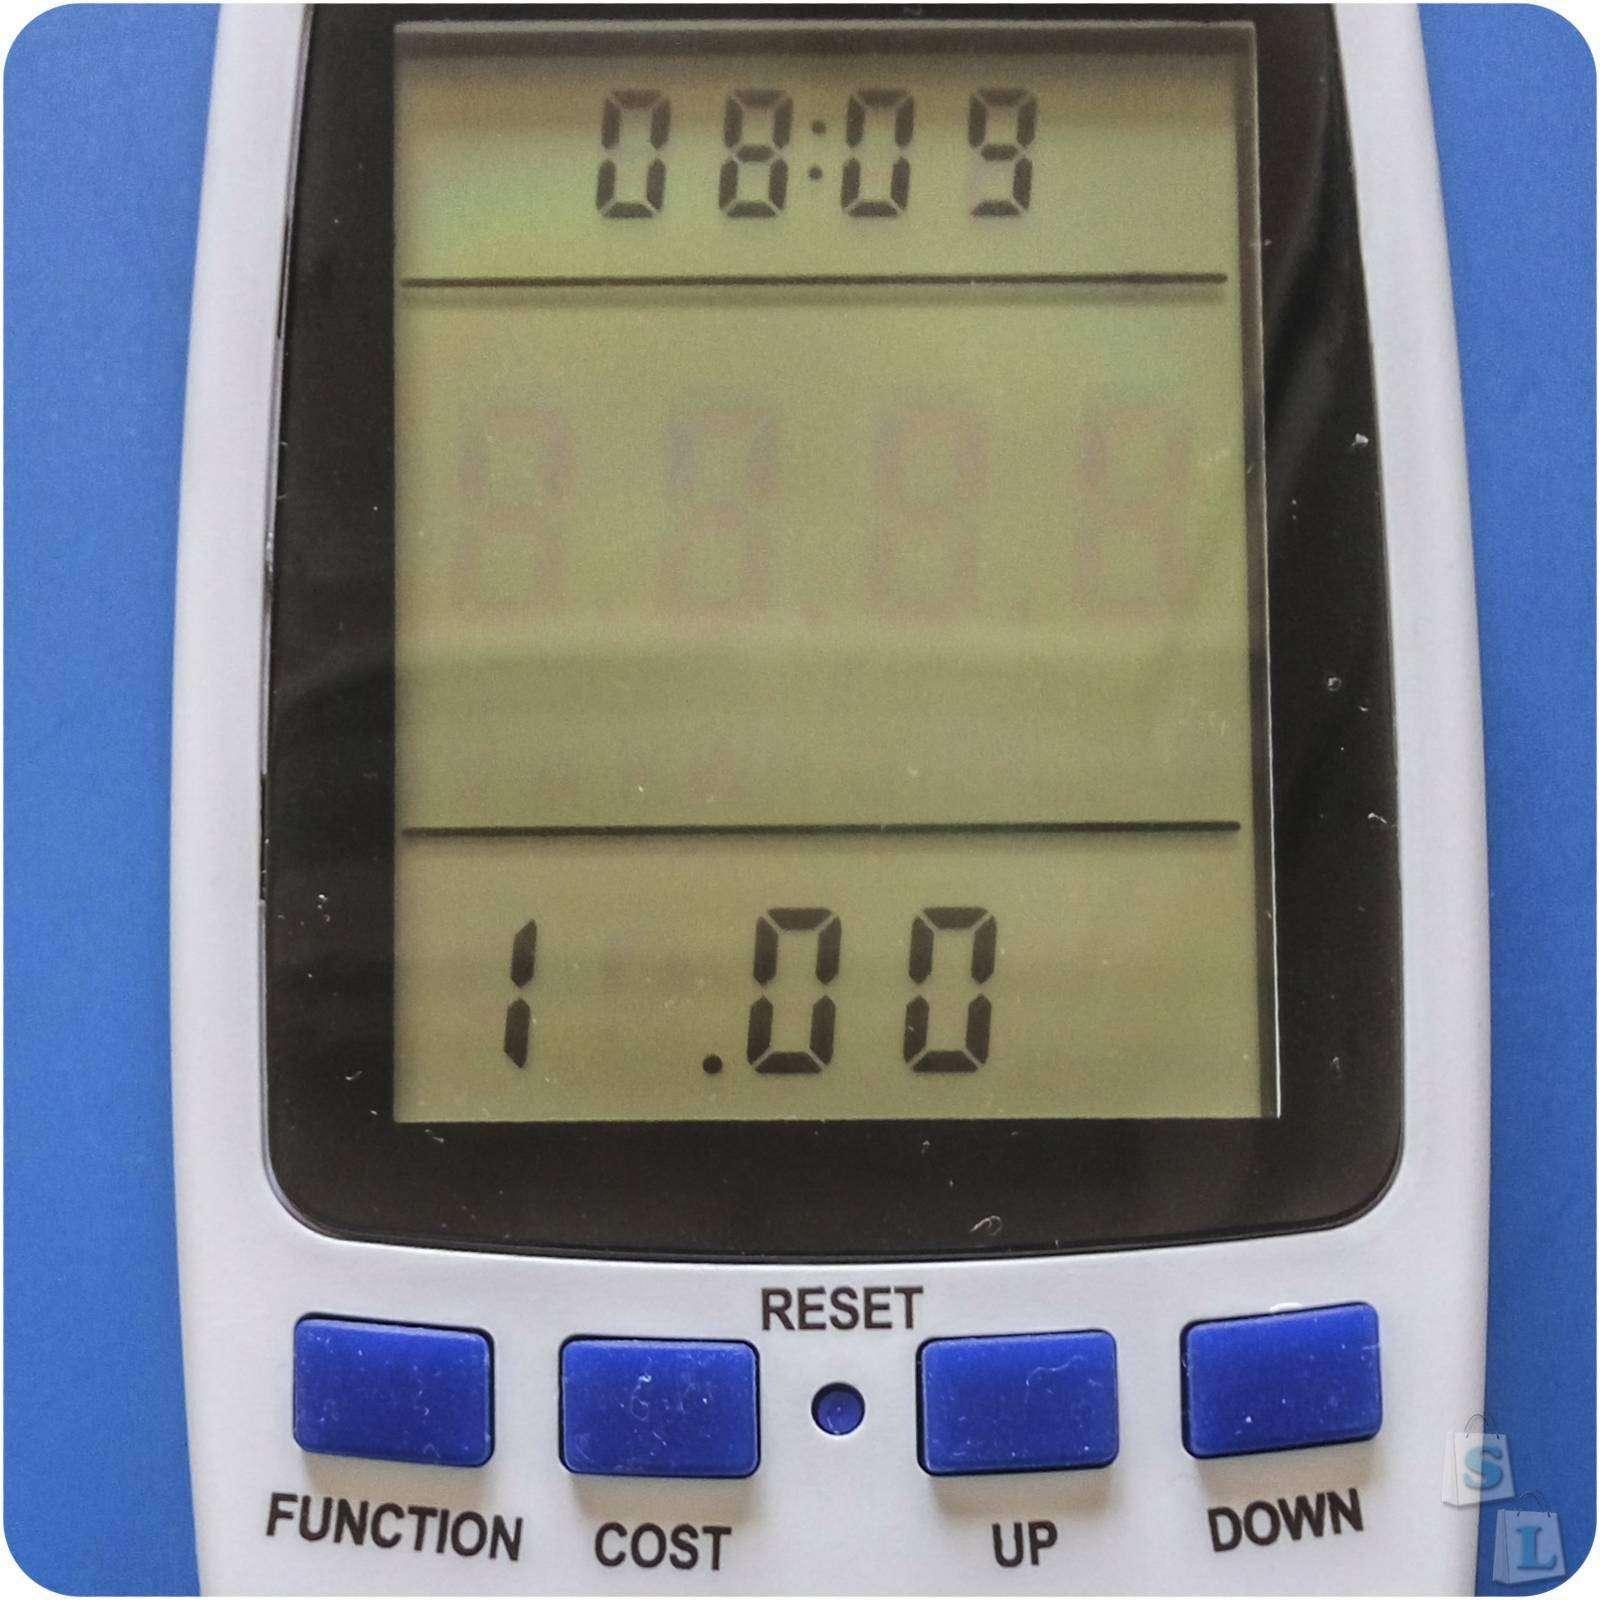 Banggood: Домашний энергомонитор - ваттметр